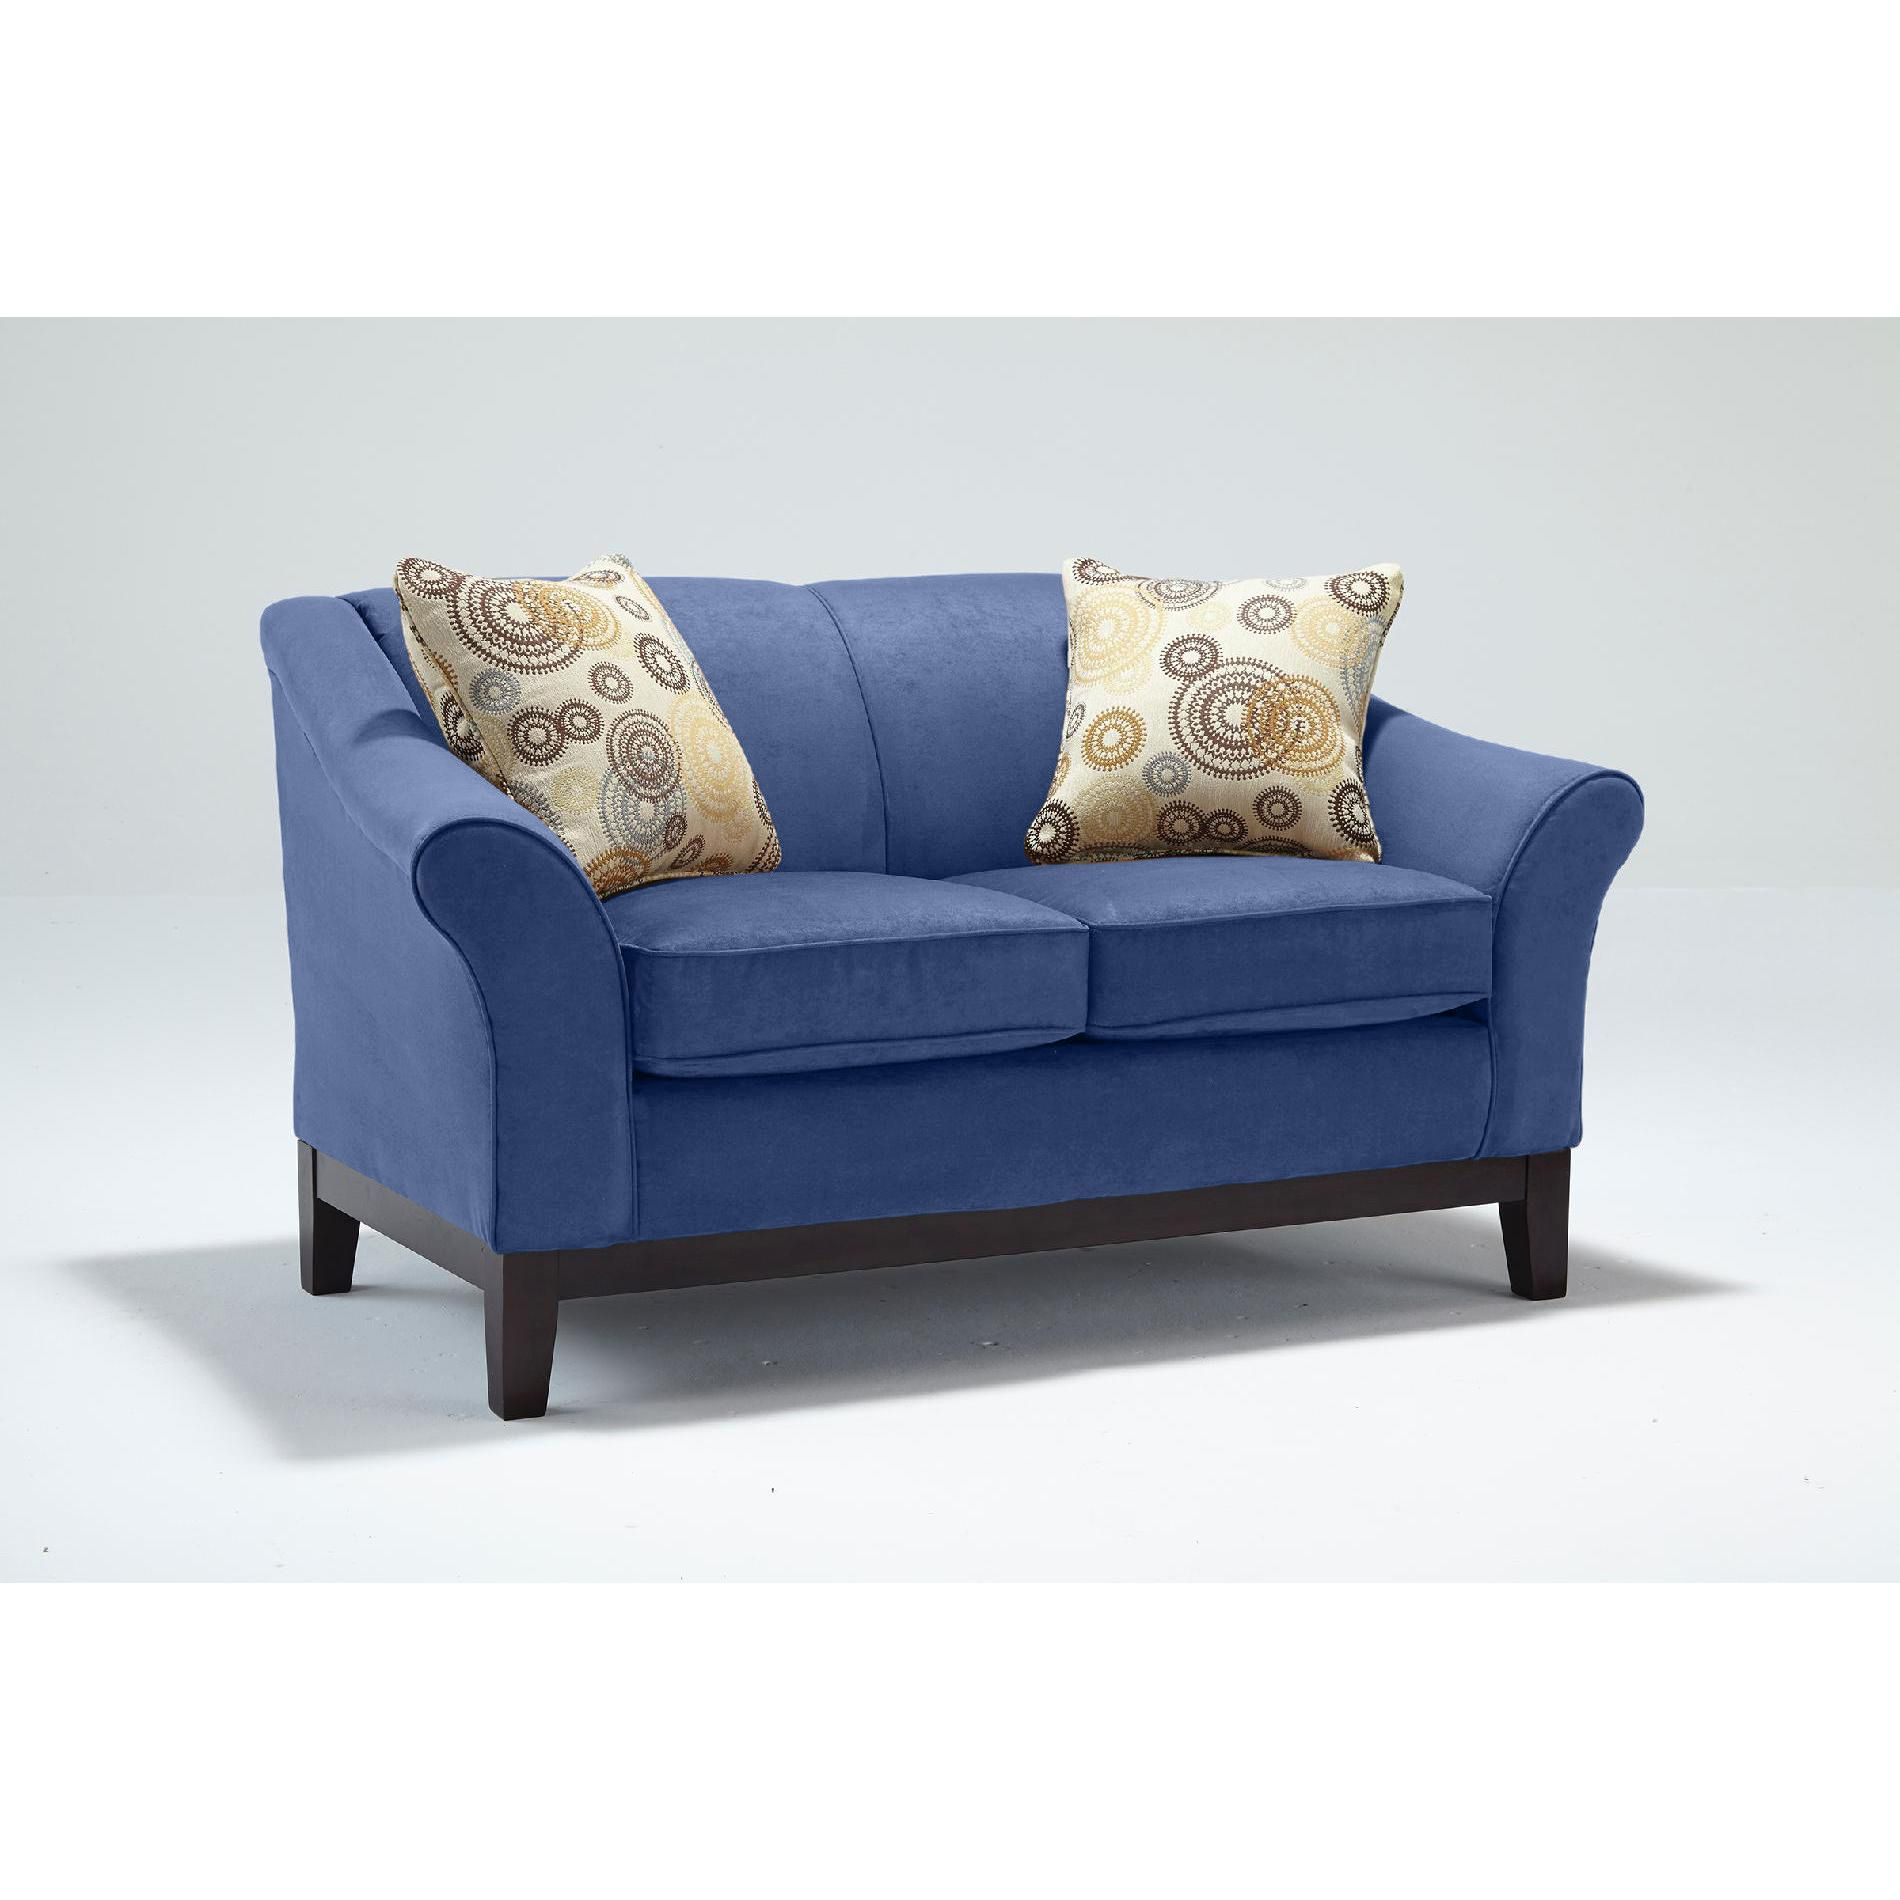 com loveseat rolled amazon dining kitchen couch melaina blackberry velvet plum tufted dp arm chesterfield